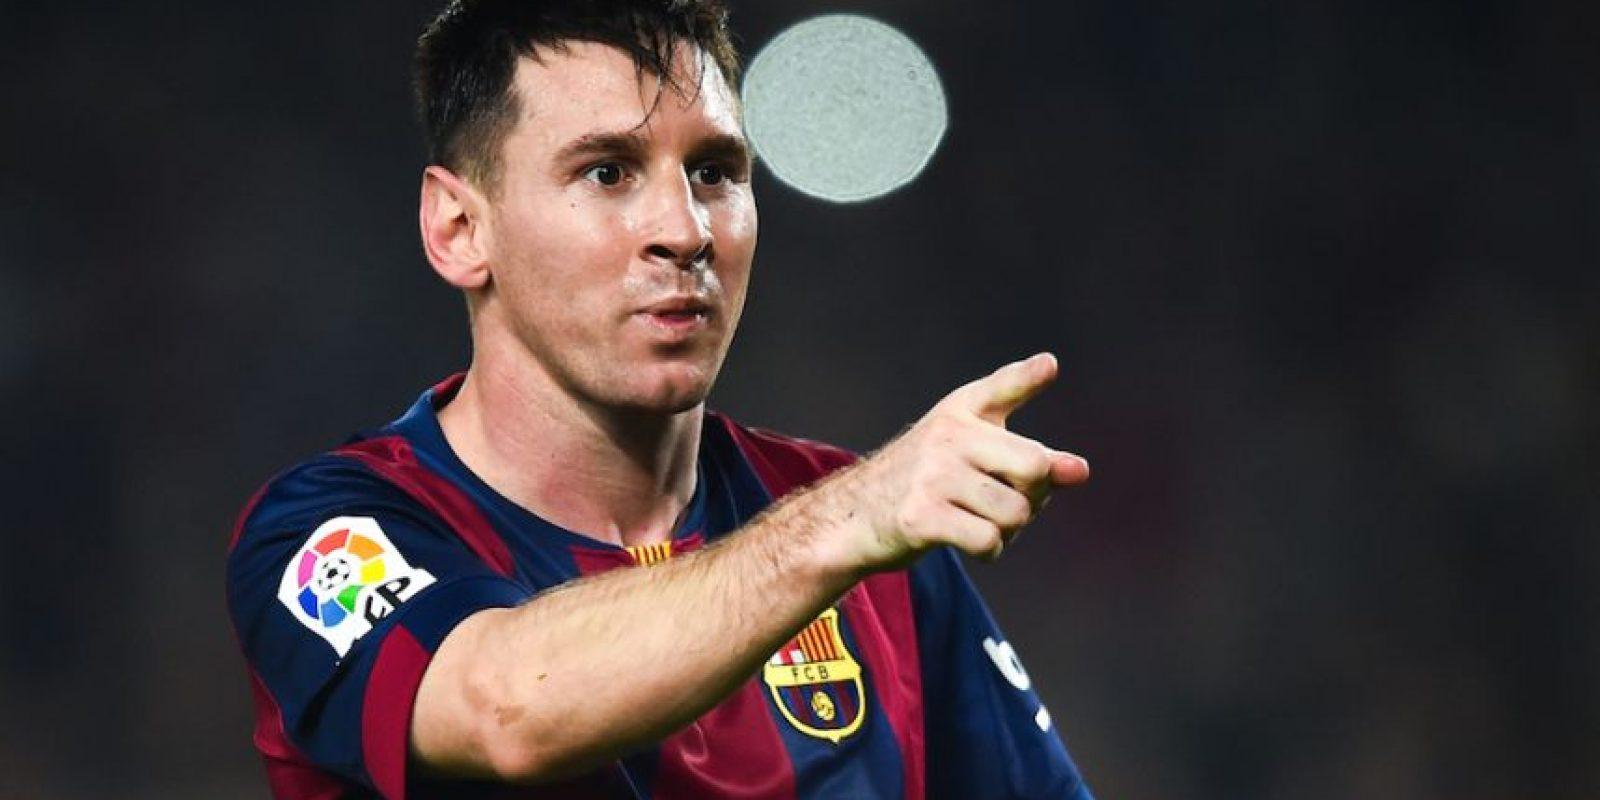 Messi tiene 71 goles en la historia de la UEFA Champions League. Foto:Getty Images